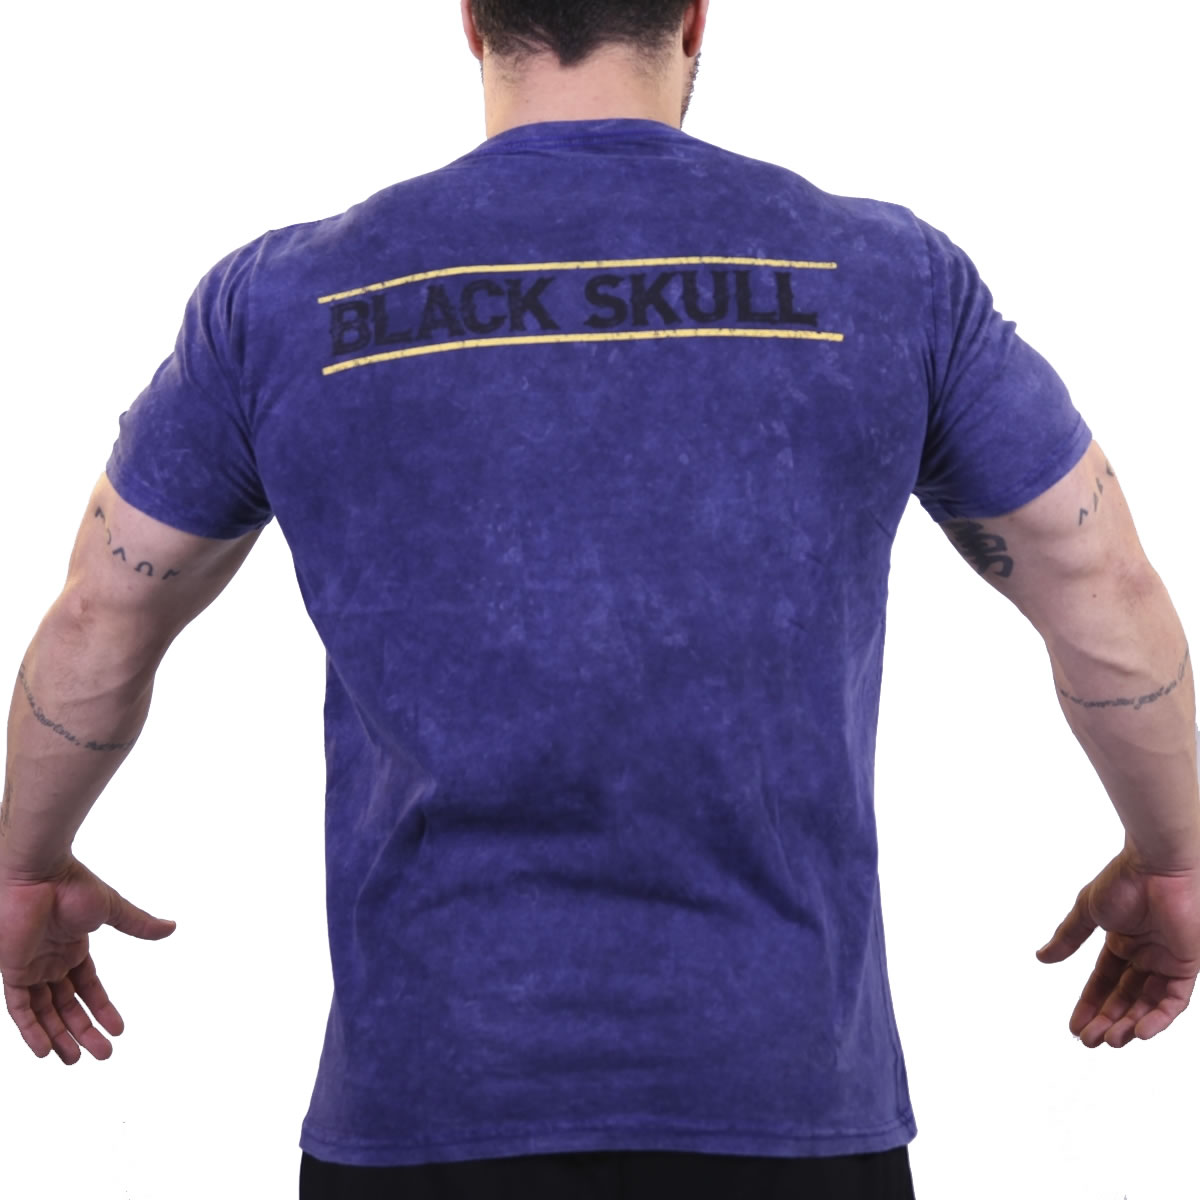 Camiseta Bones Army Azul - Black Skull Clothing